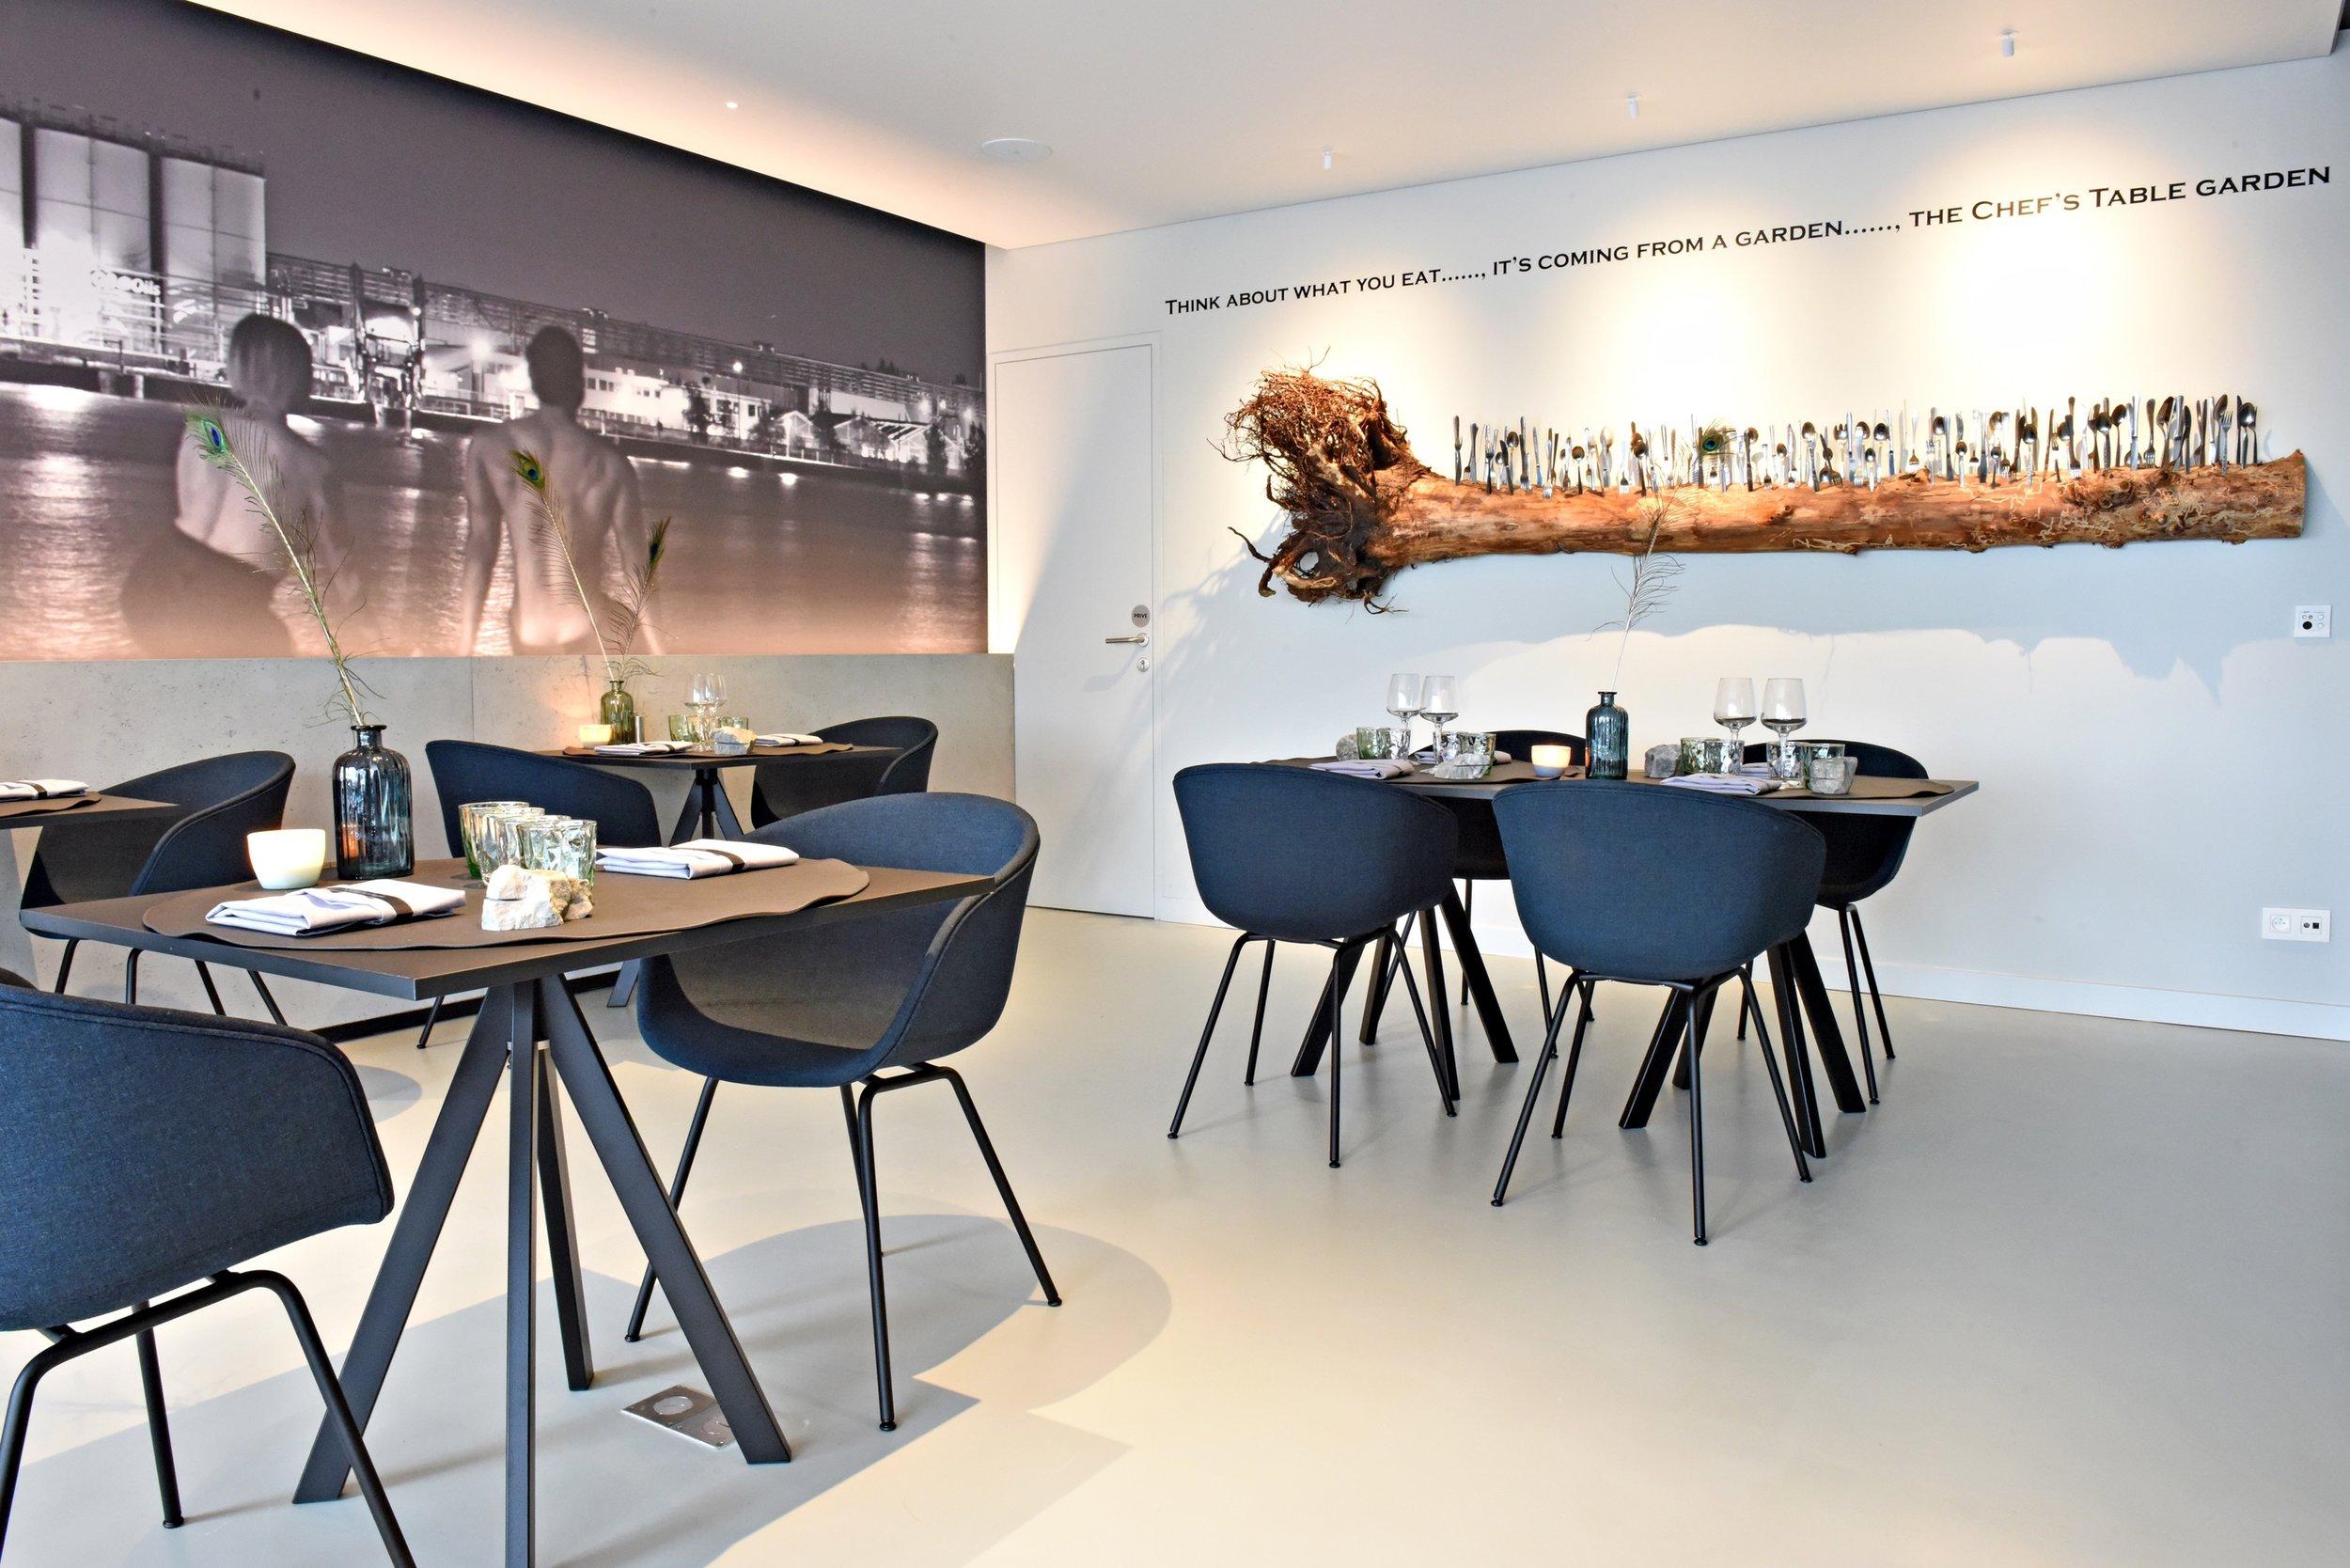 9 chefs table bart albrecht tablefever pittig.jpeg.jpg.jpg